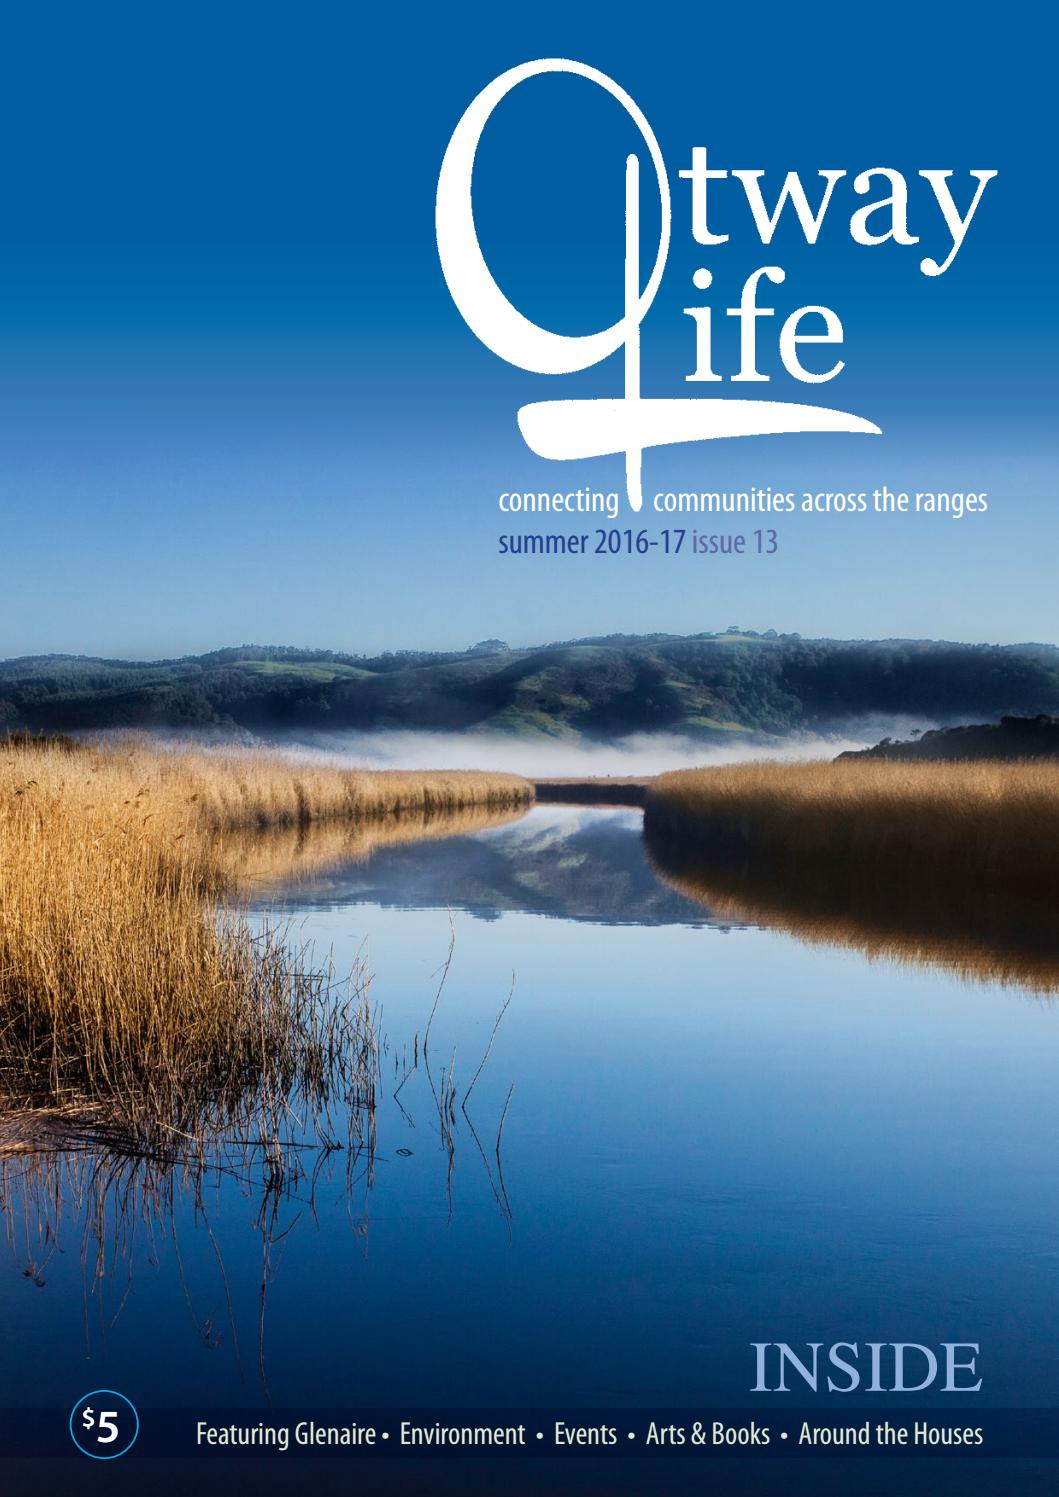 Otway life summer16 17 by Otway Life Magazine - issuu